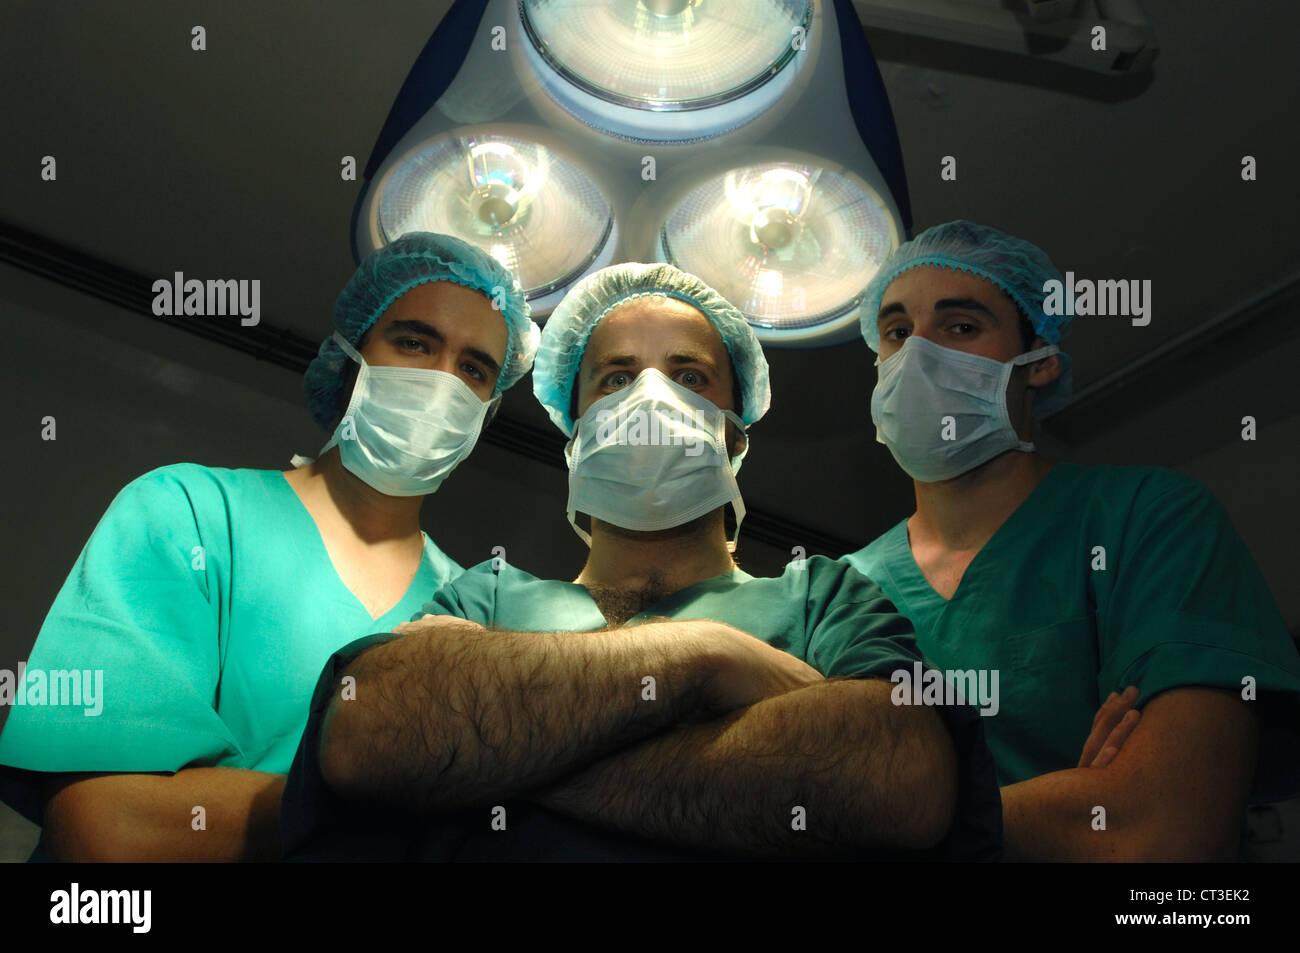 Three surgeons standing underneath a theatre light. - Stock Image